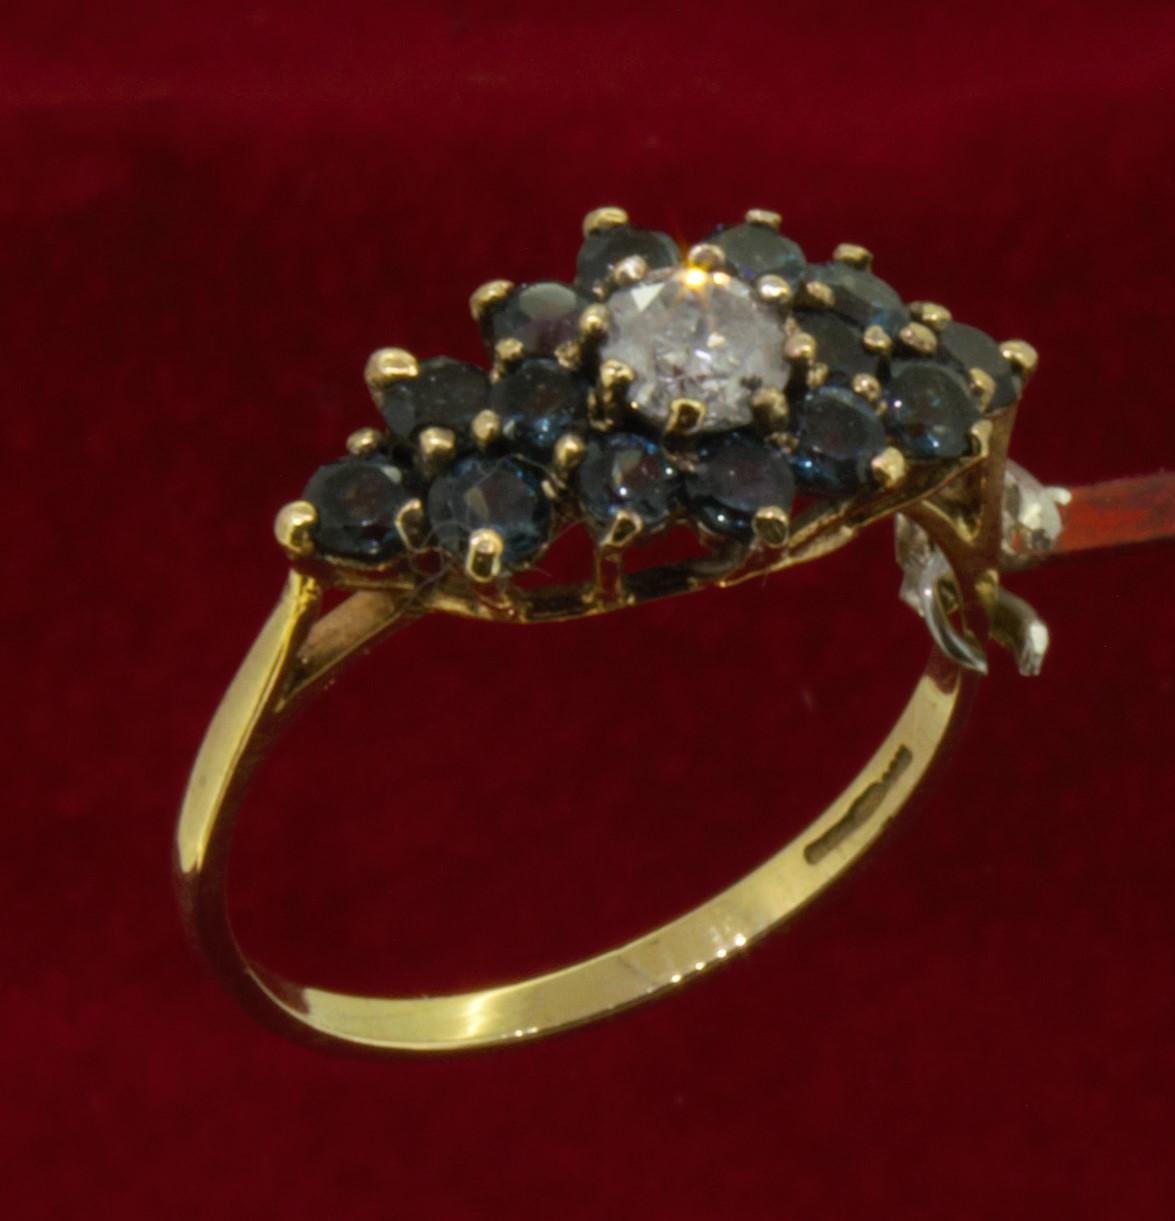 9ct (375) Yellow Gold 0.25ct Diamond & London Topaz Cluster Style Dress Ring